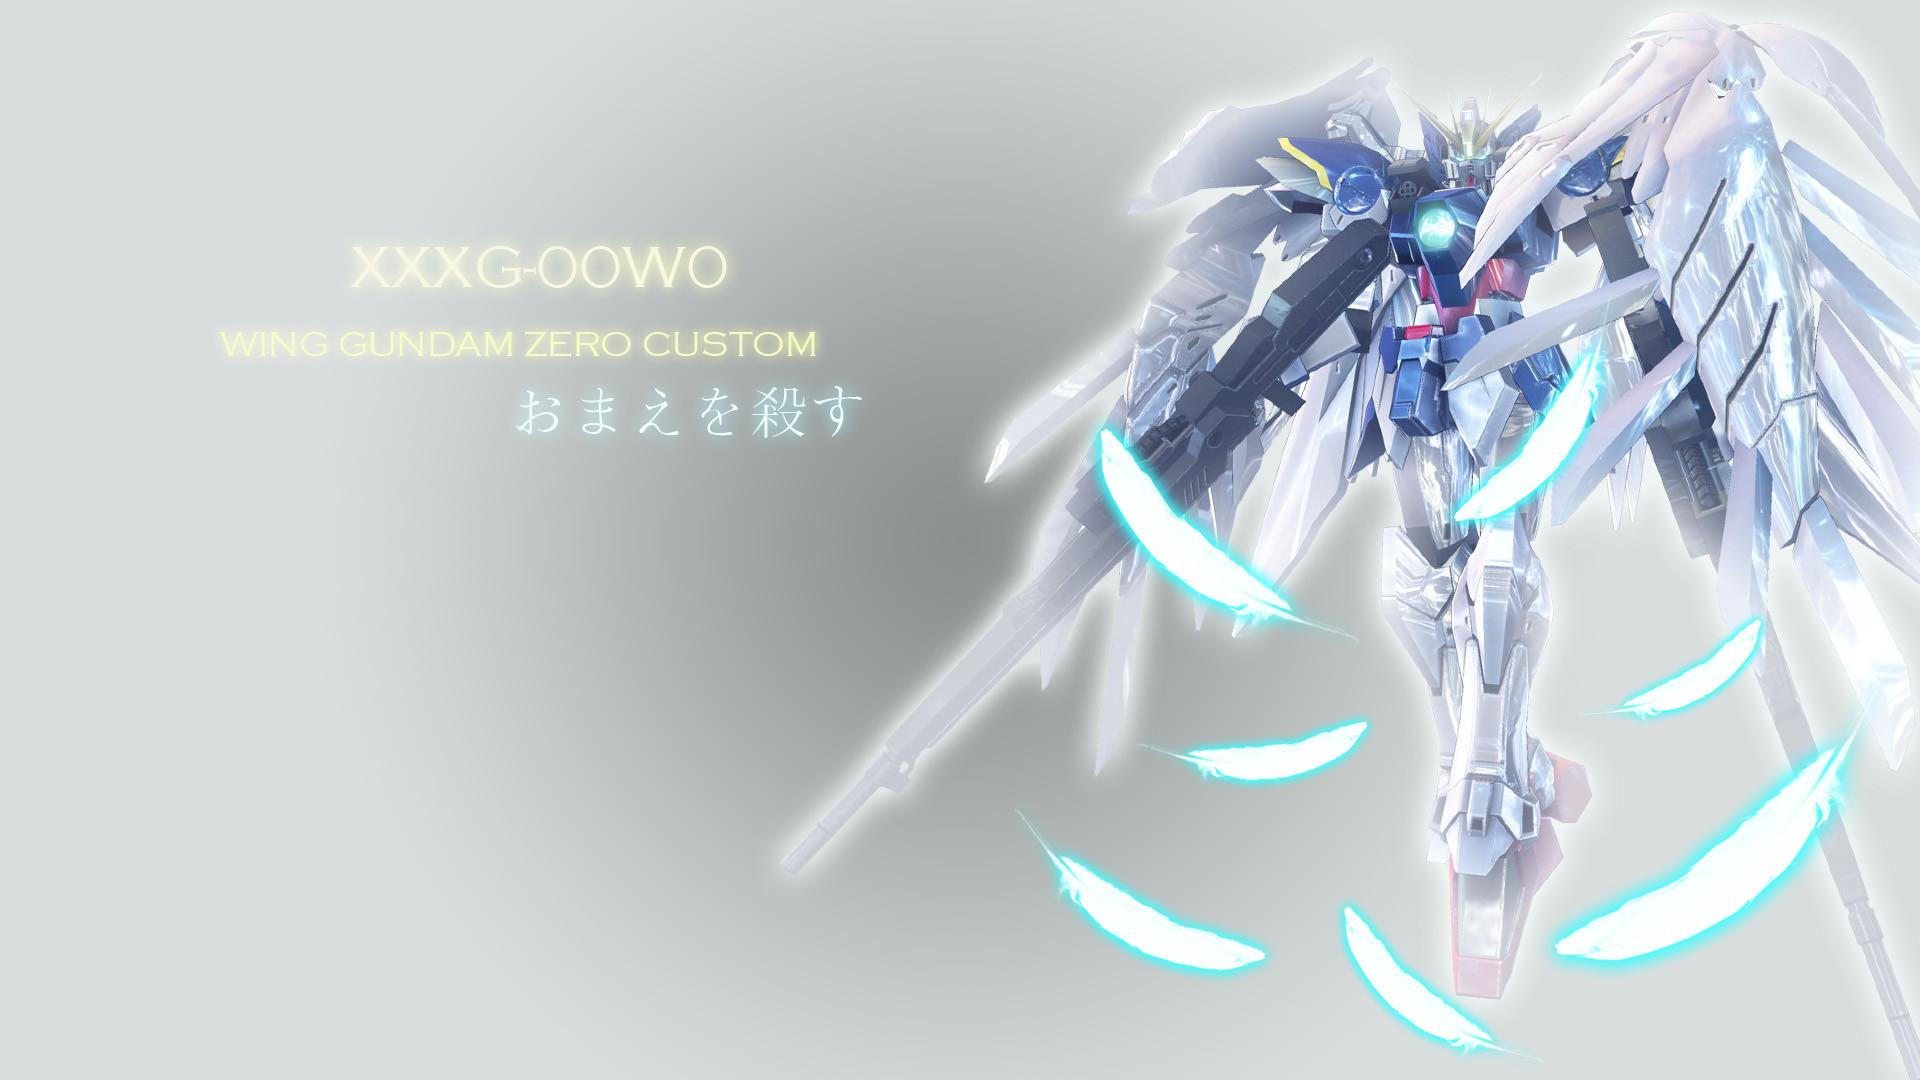 Tags: Anime, Mobile Suit Gundam Wing, Wing Gundam, Wallpaper, HD Wallpaper